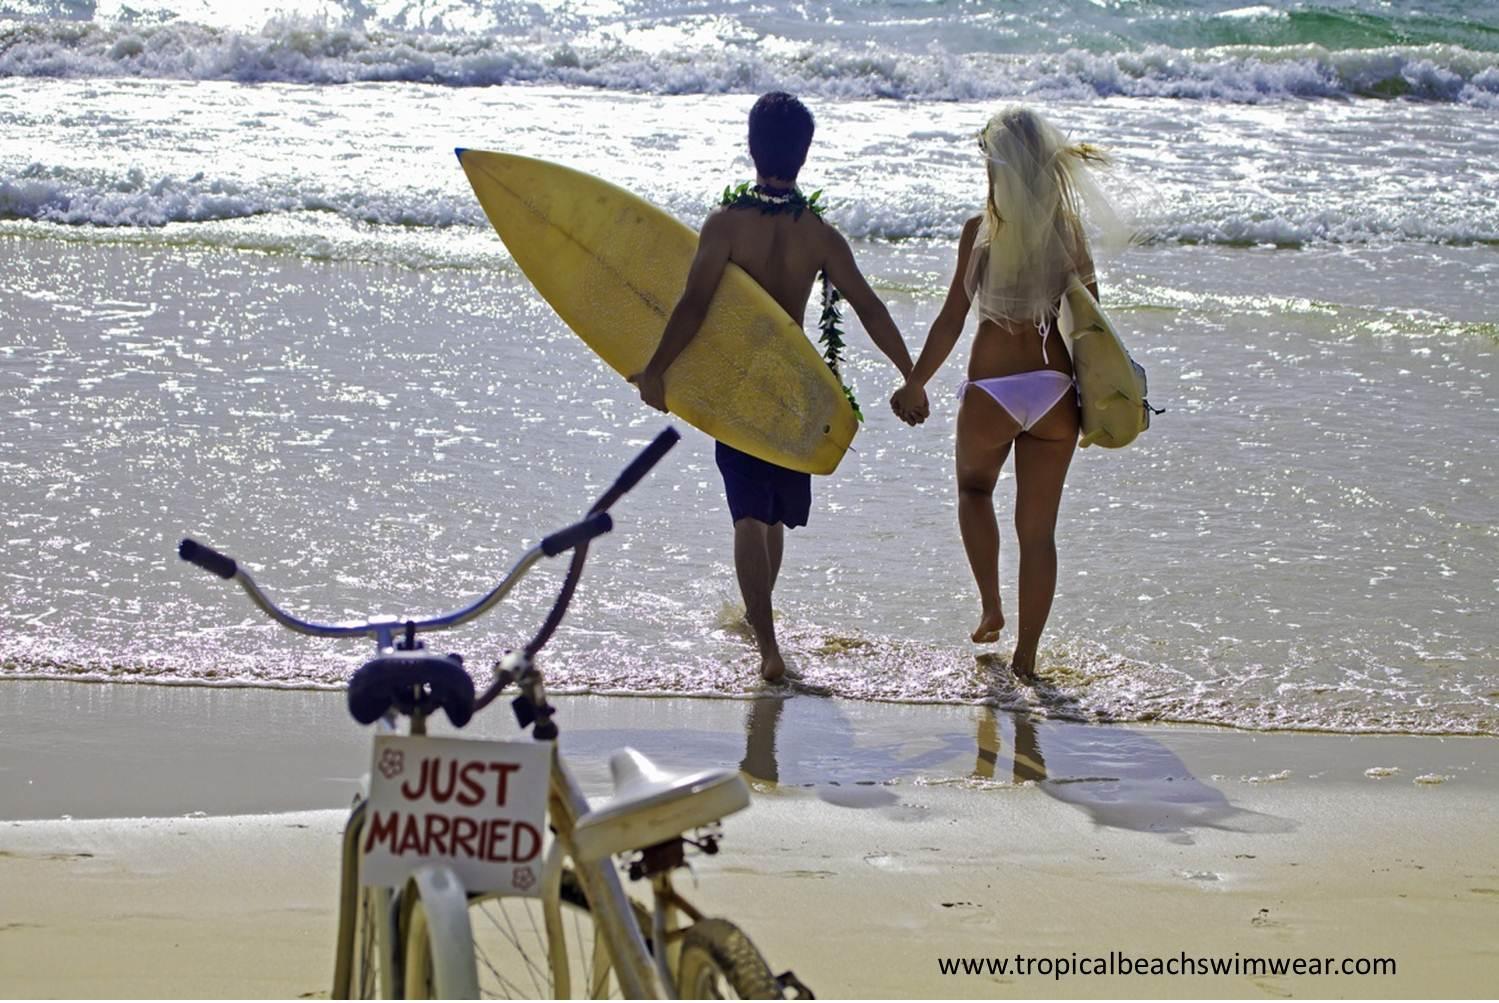 Beach weddings bikinis